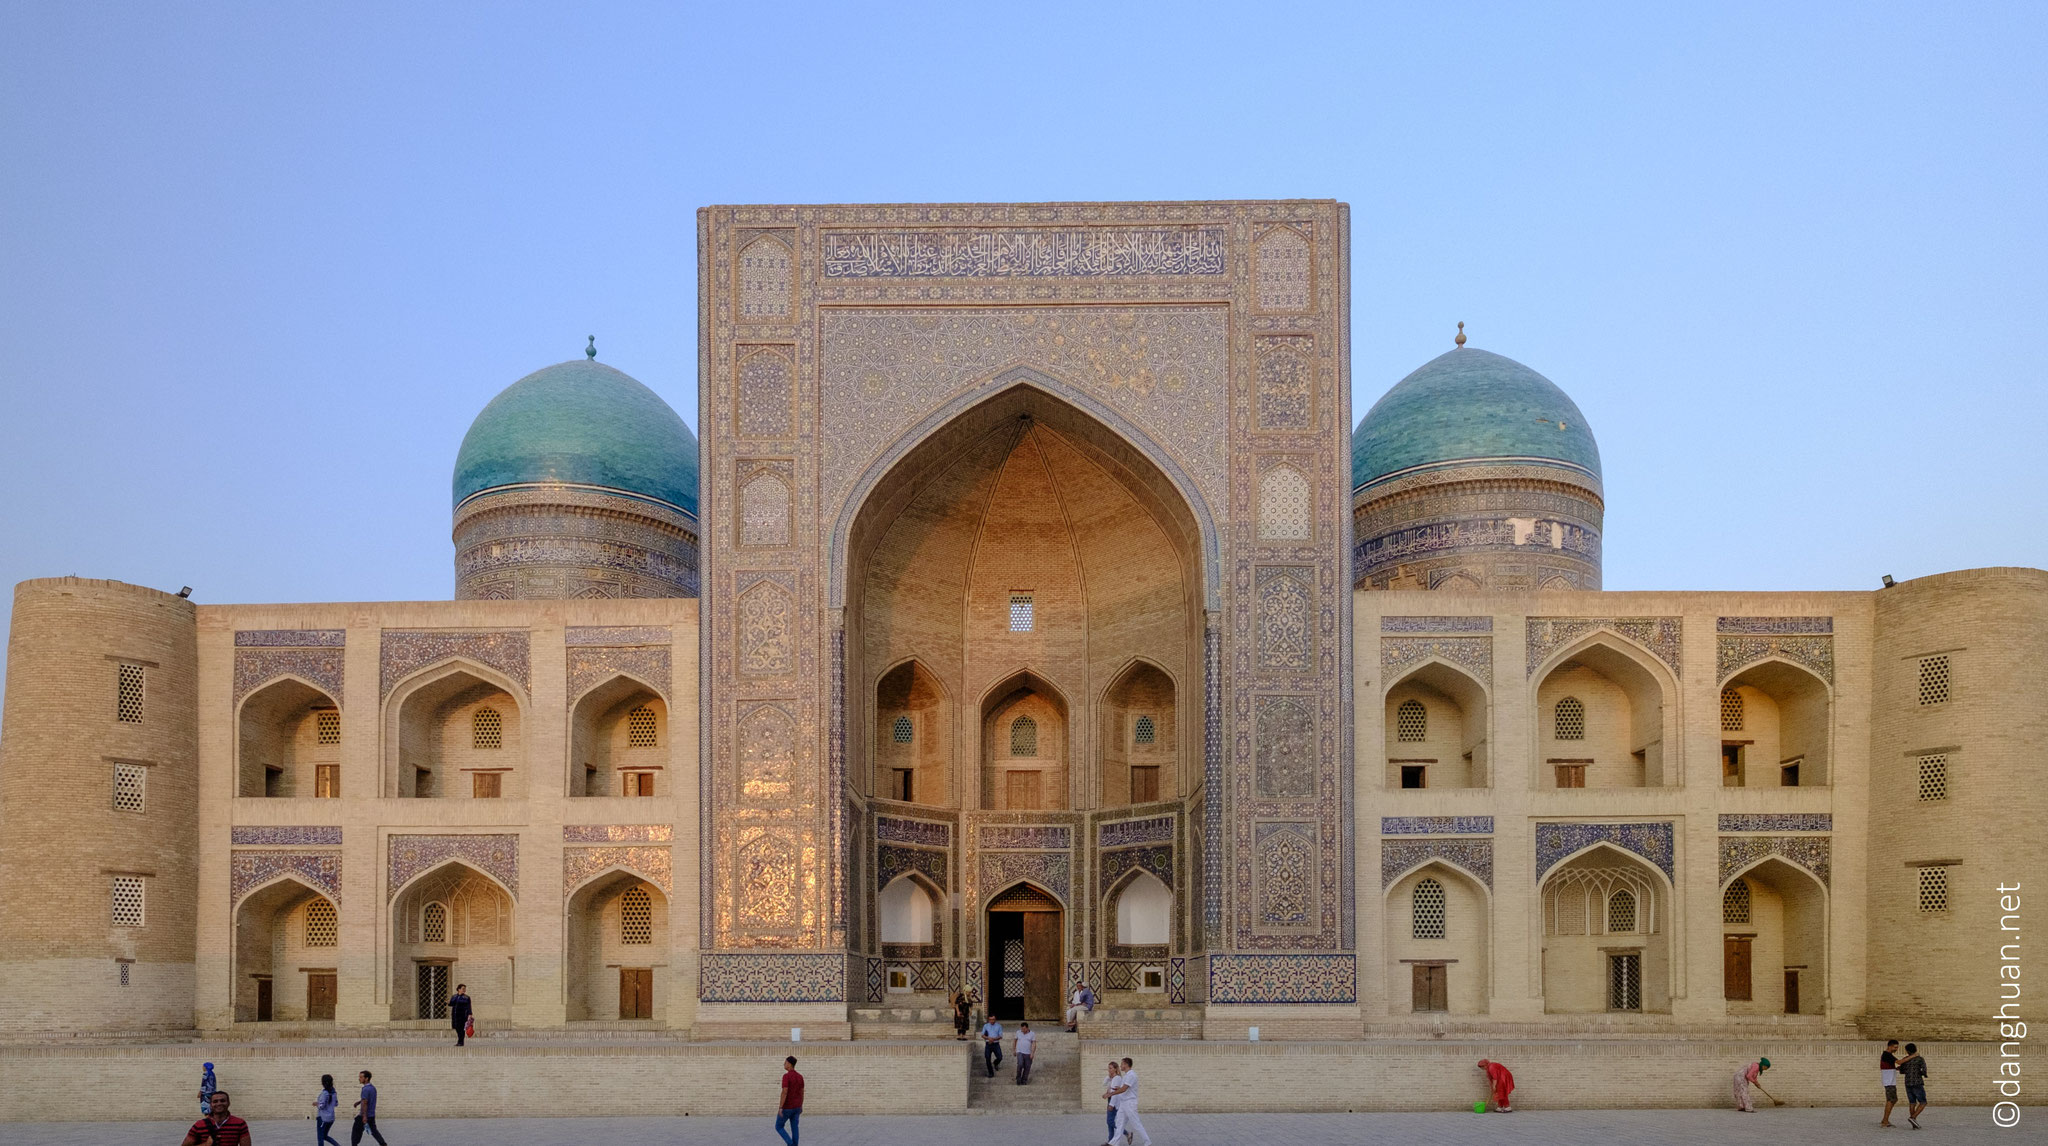 La médersa Miri-arab en face de la mosquée Kalyan